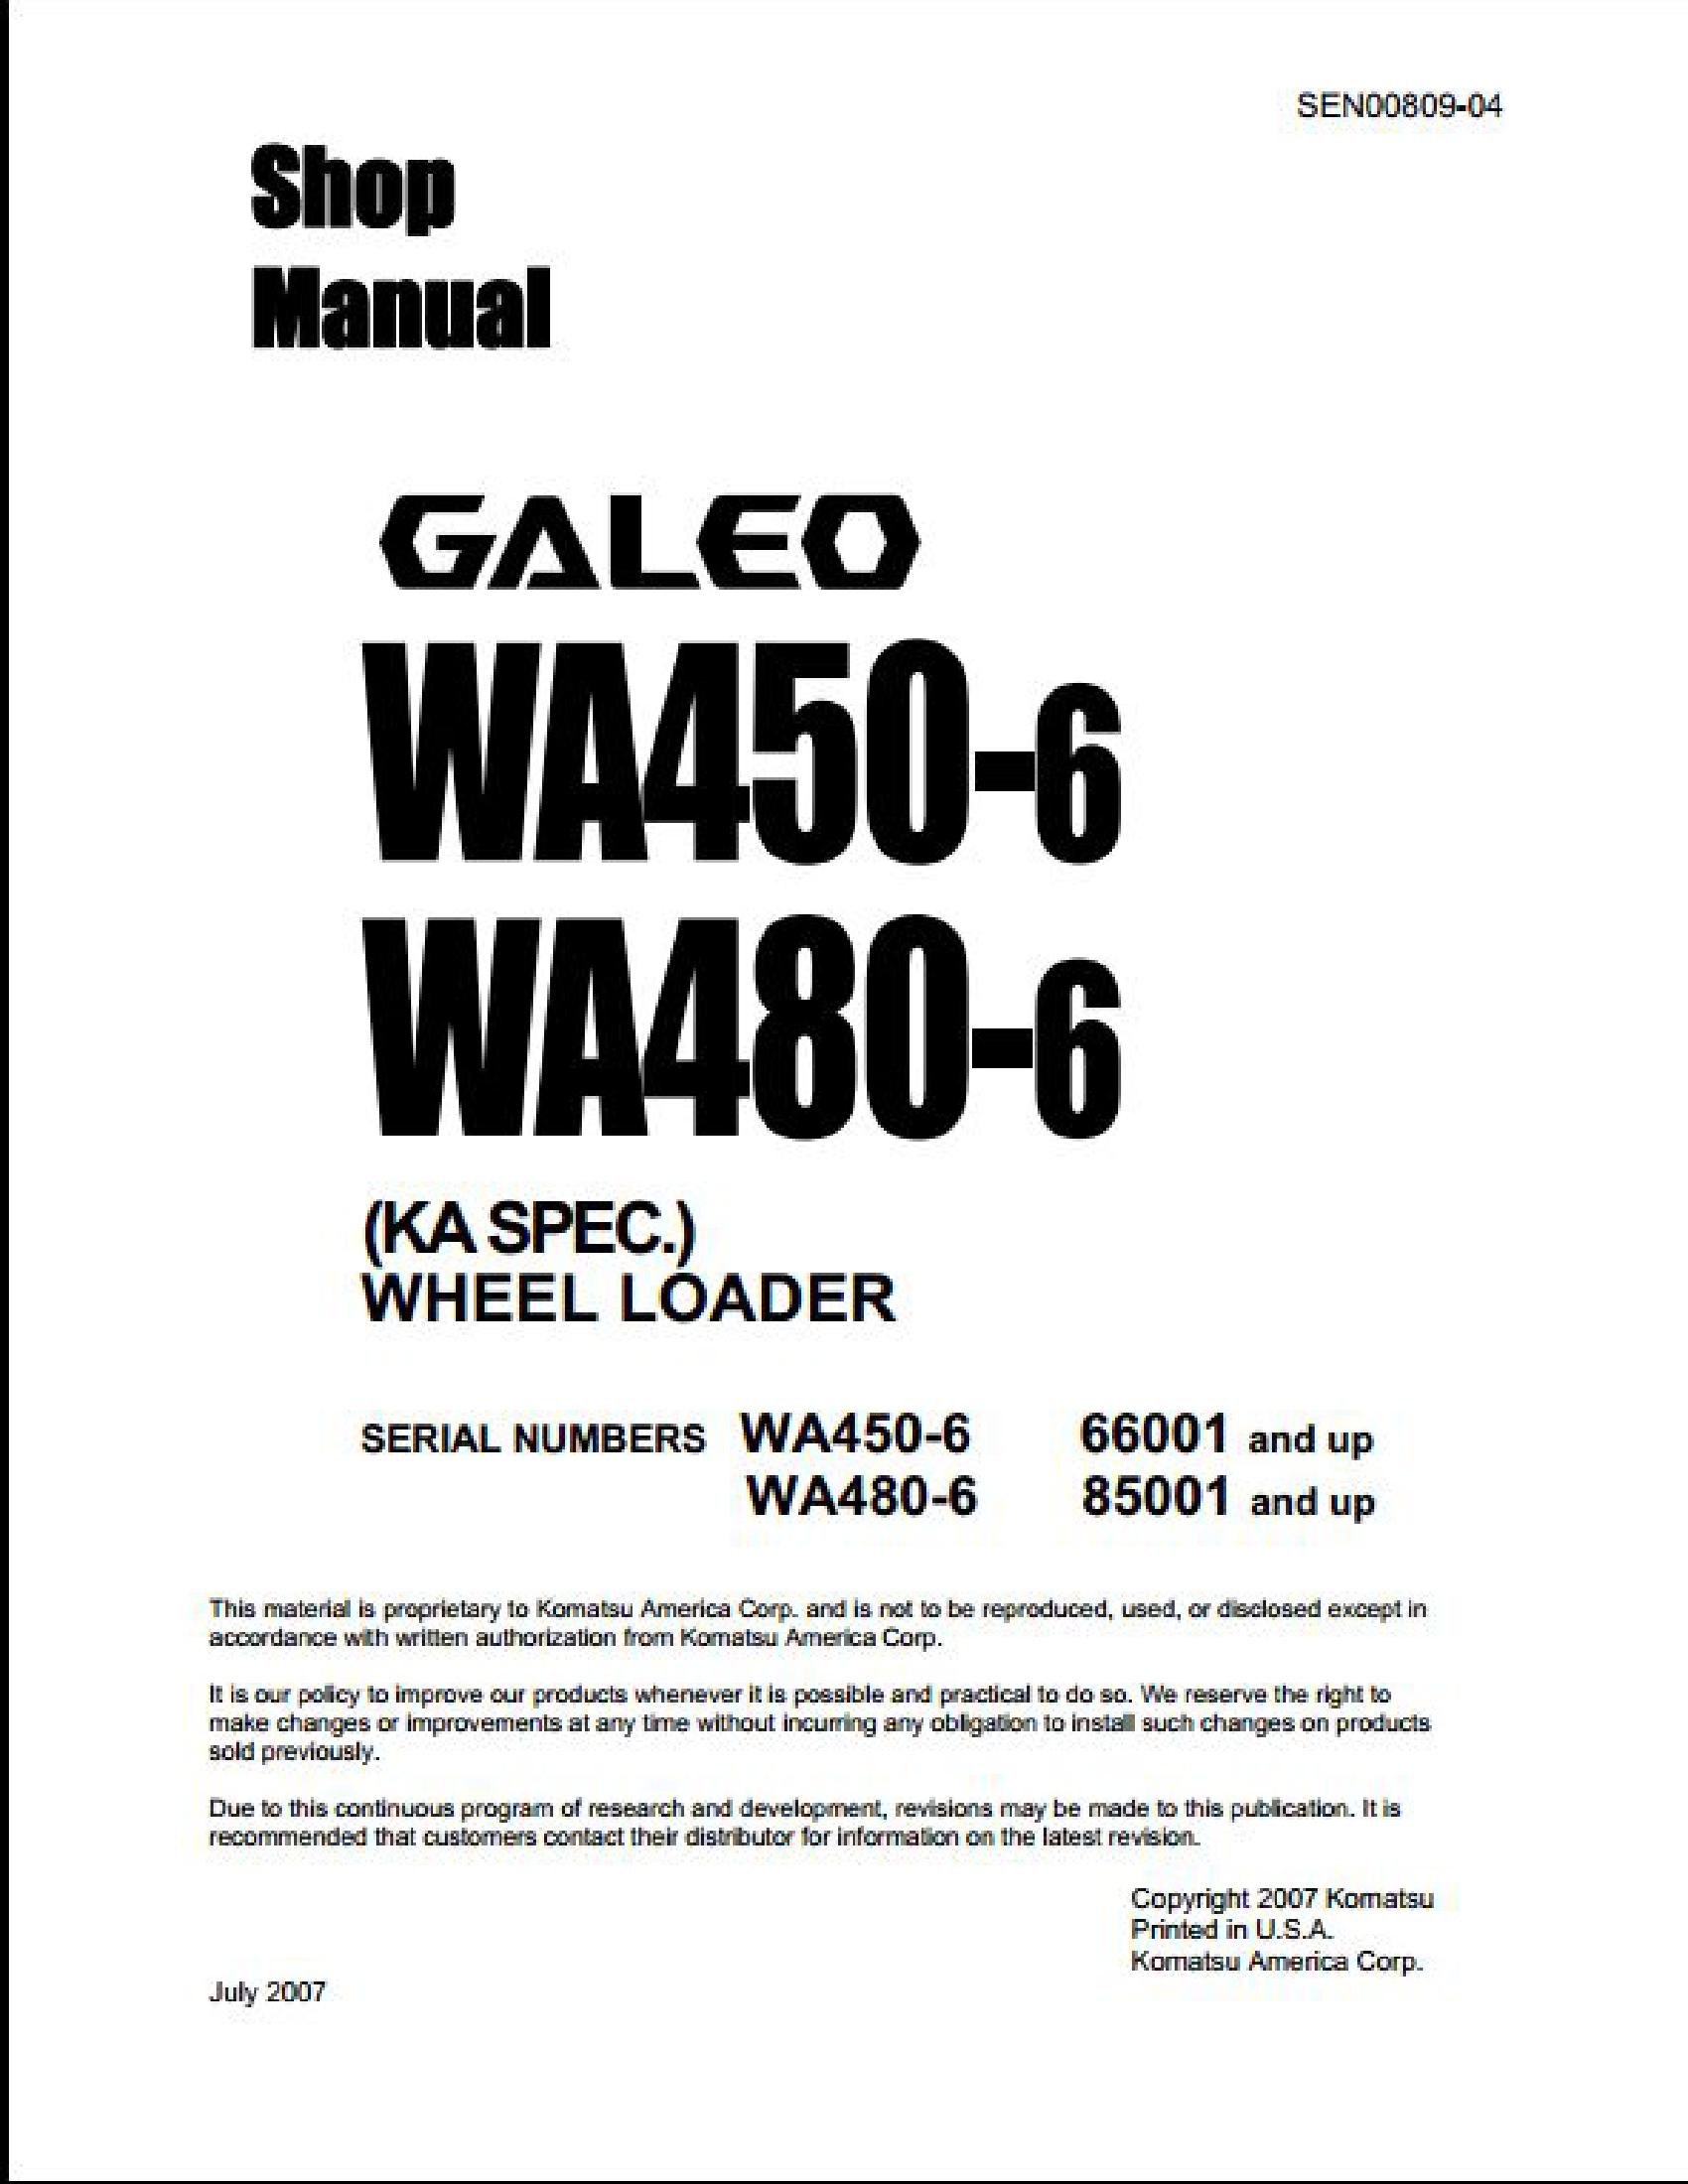 KOMATSU WA480-6 Wheel Loaders manual